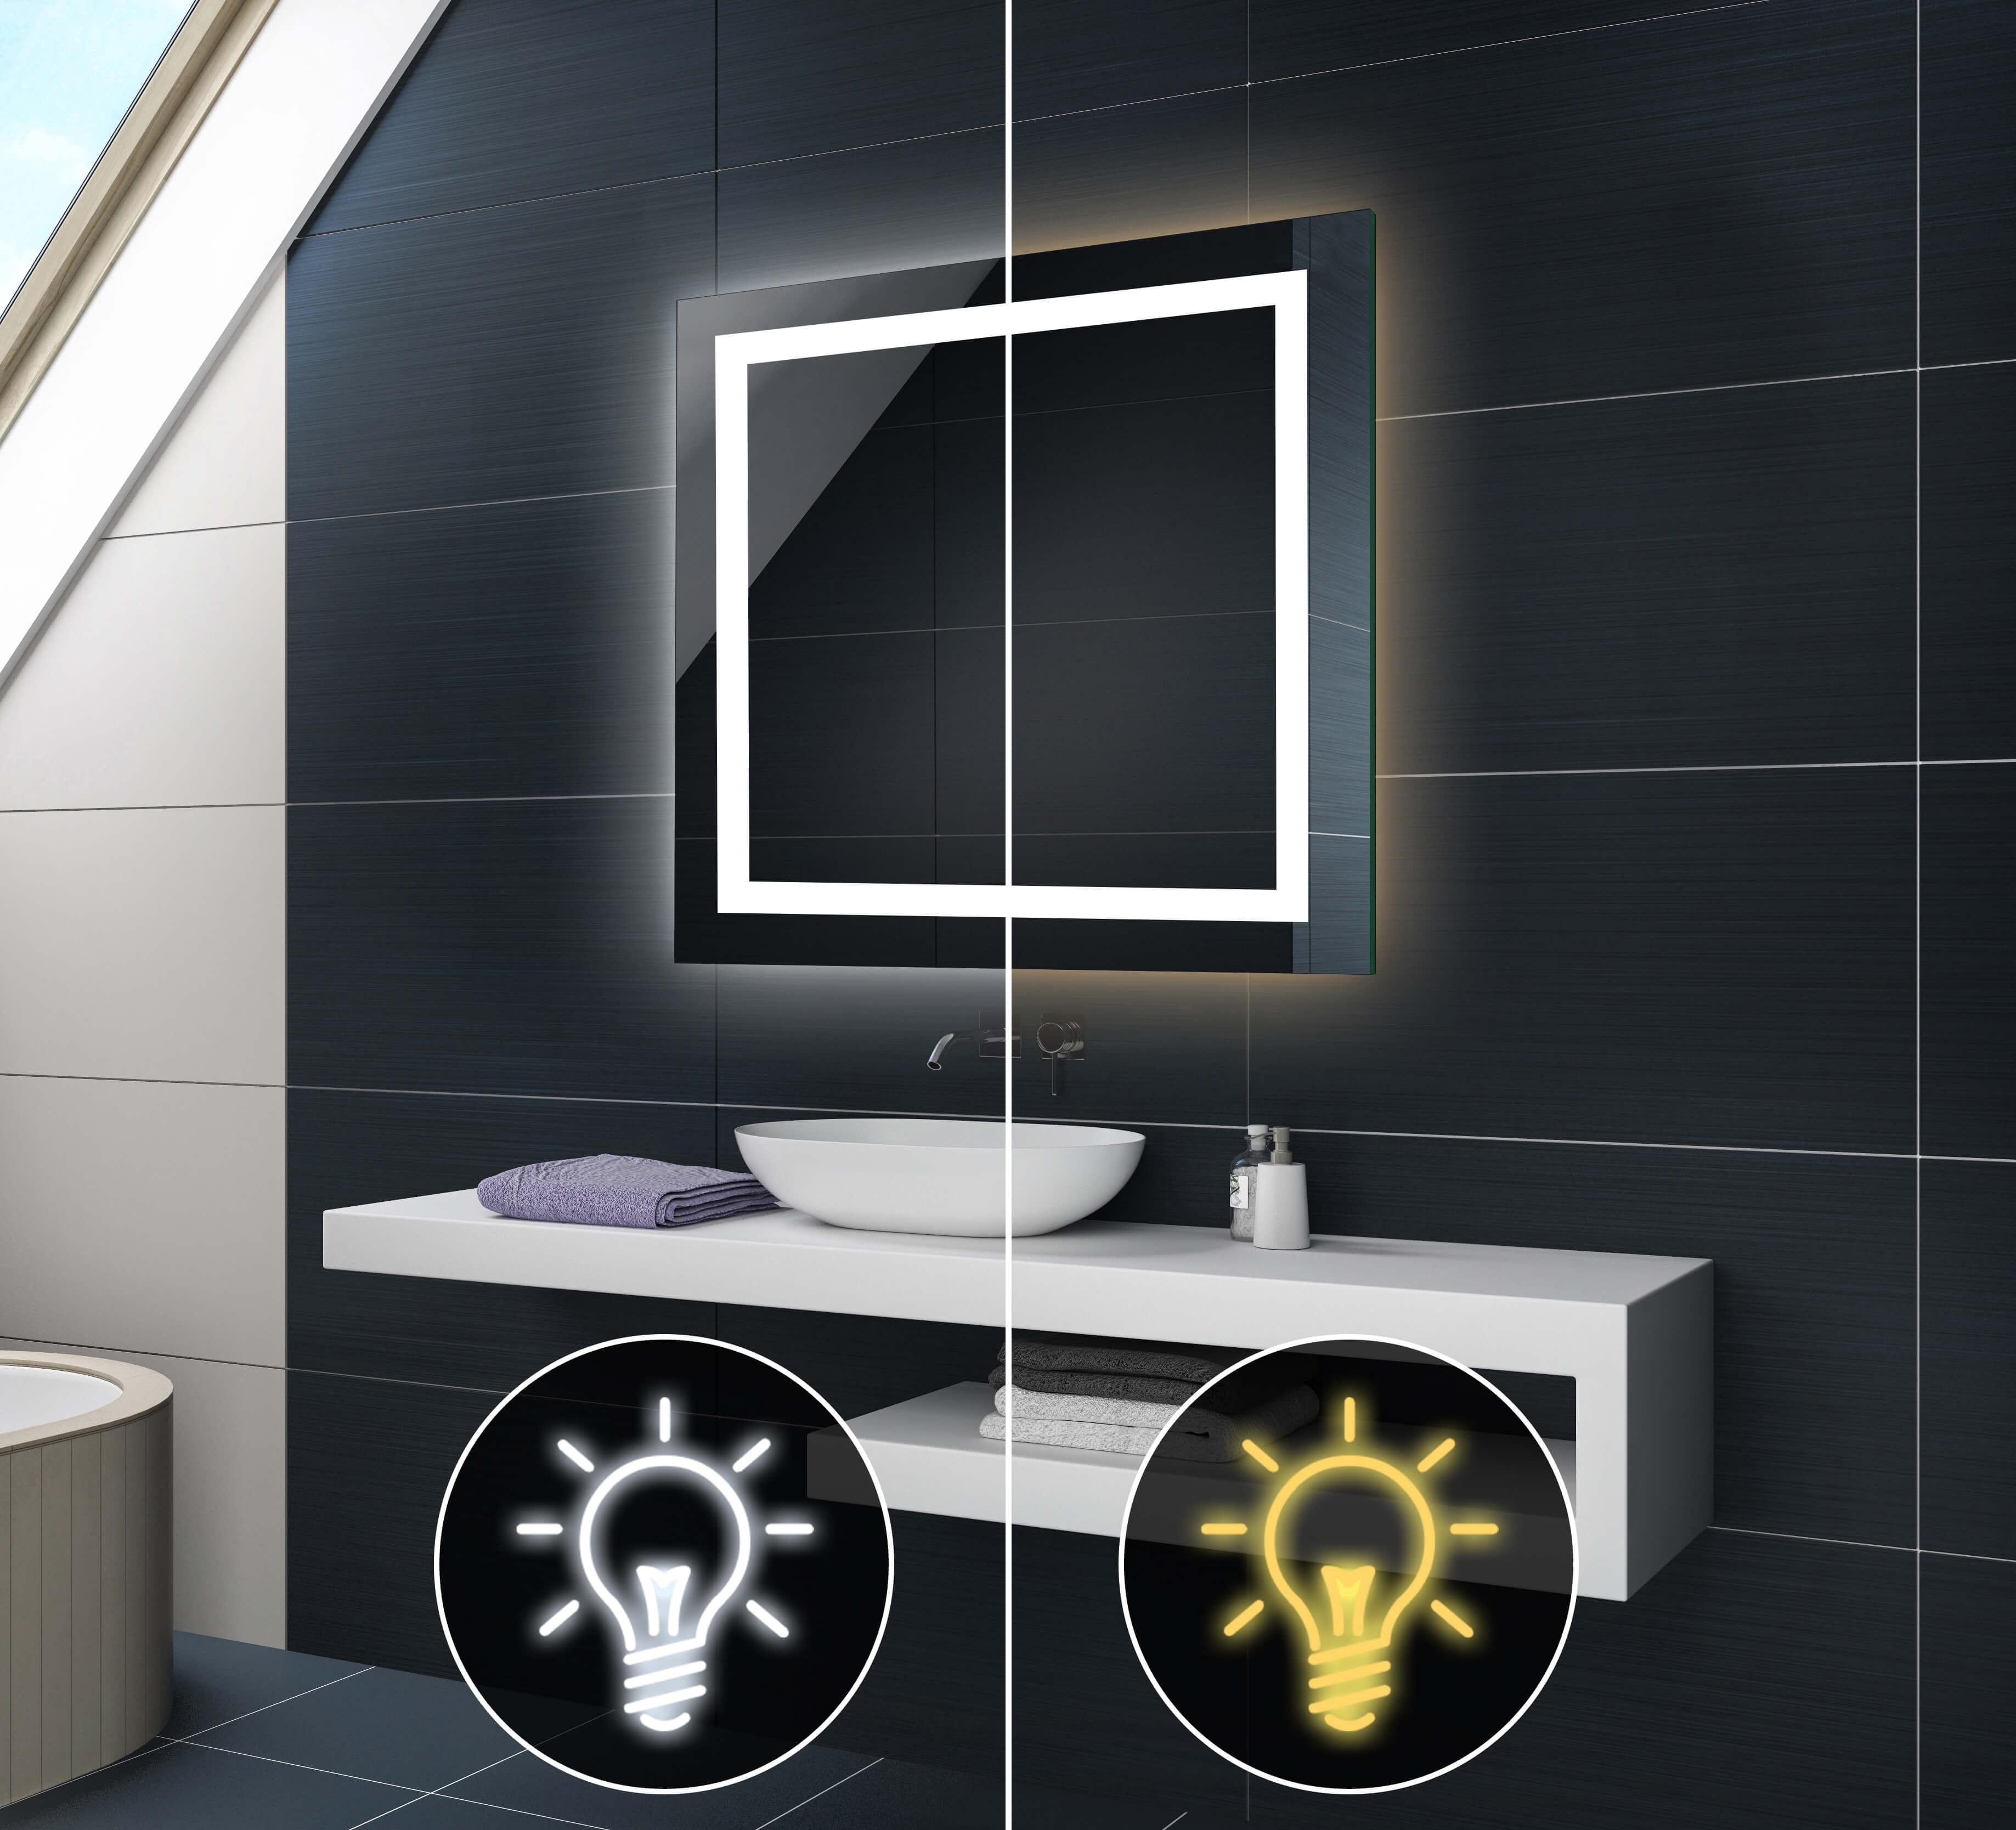 badspiegel mit led beleuchtung wandspiegel l15 mit touch. Black Bedroom Furniture Sets. Home Design Ideas